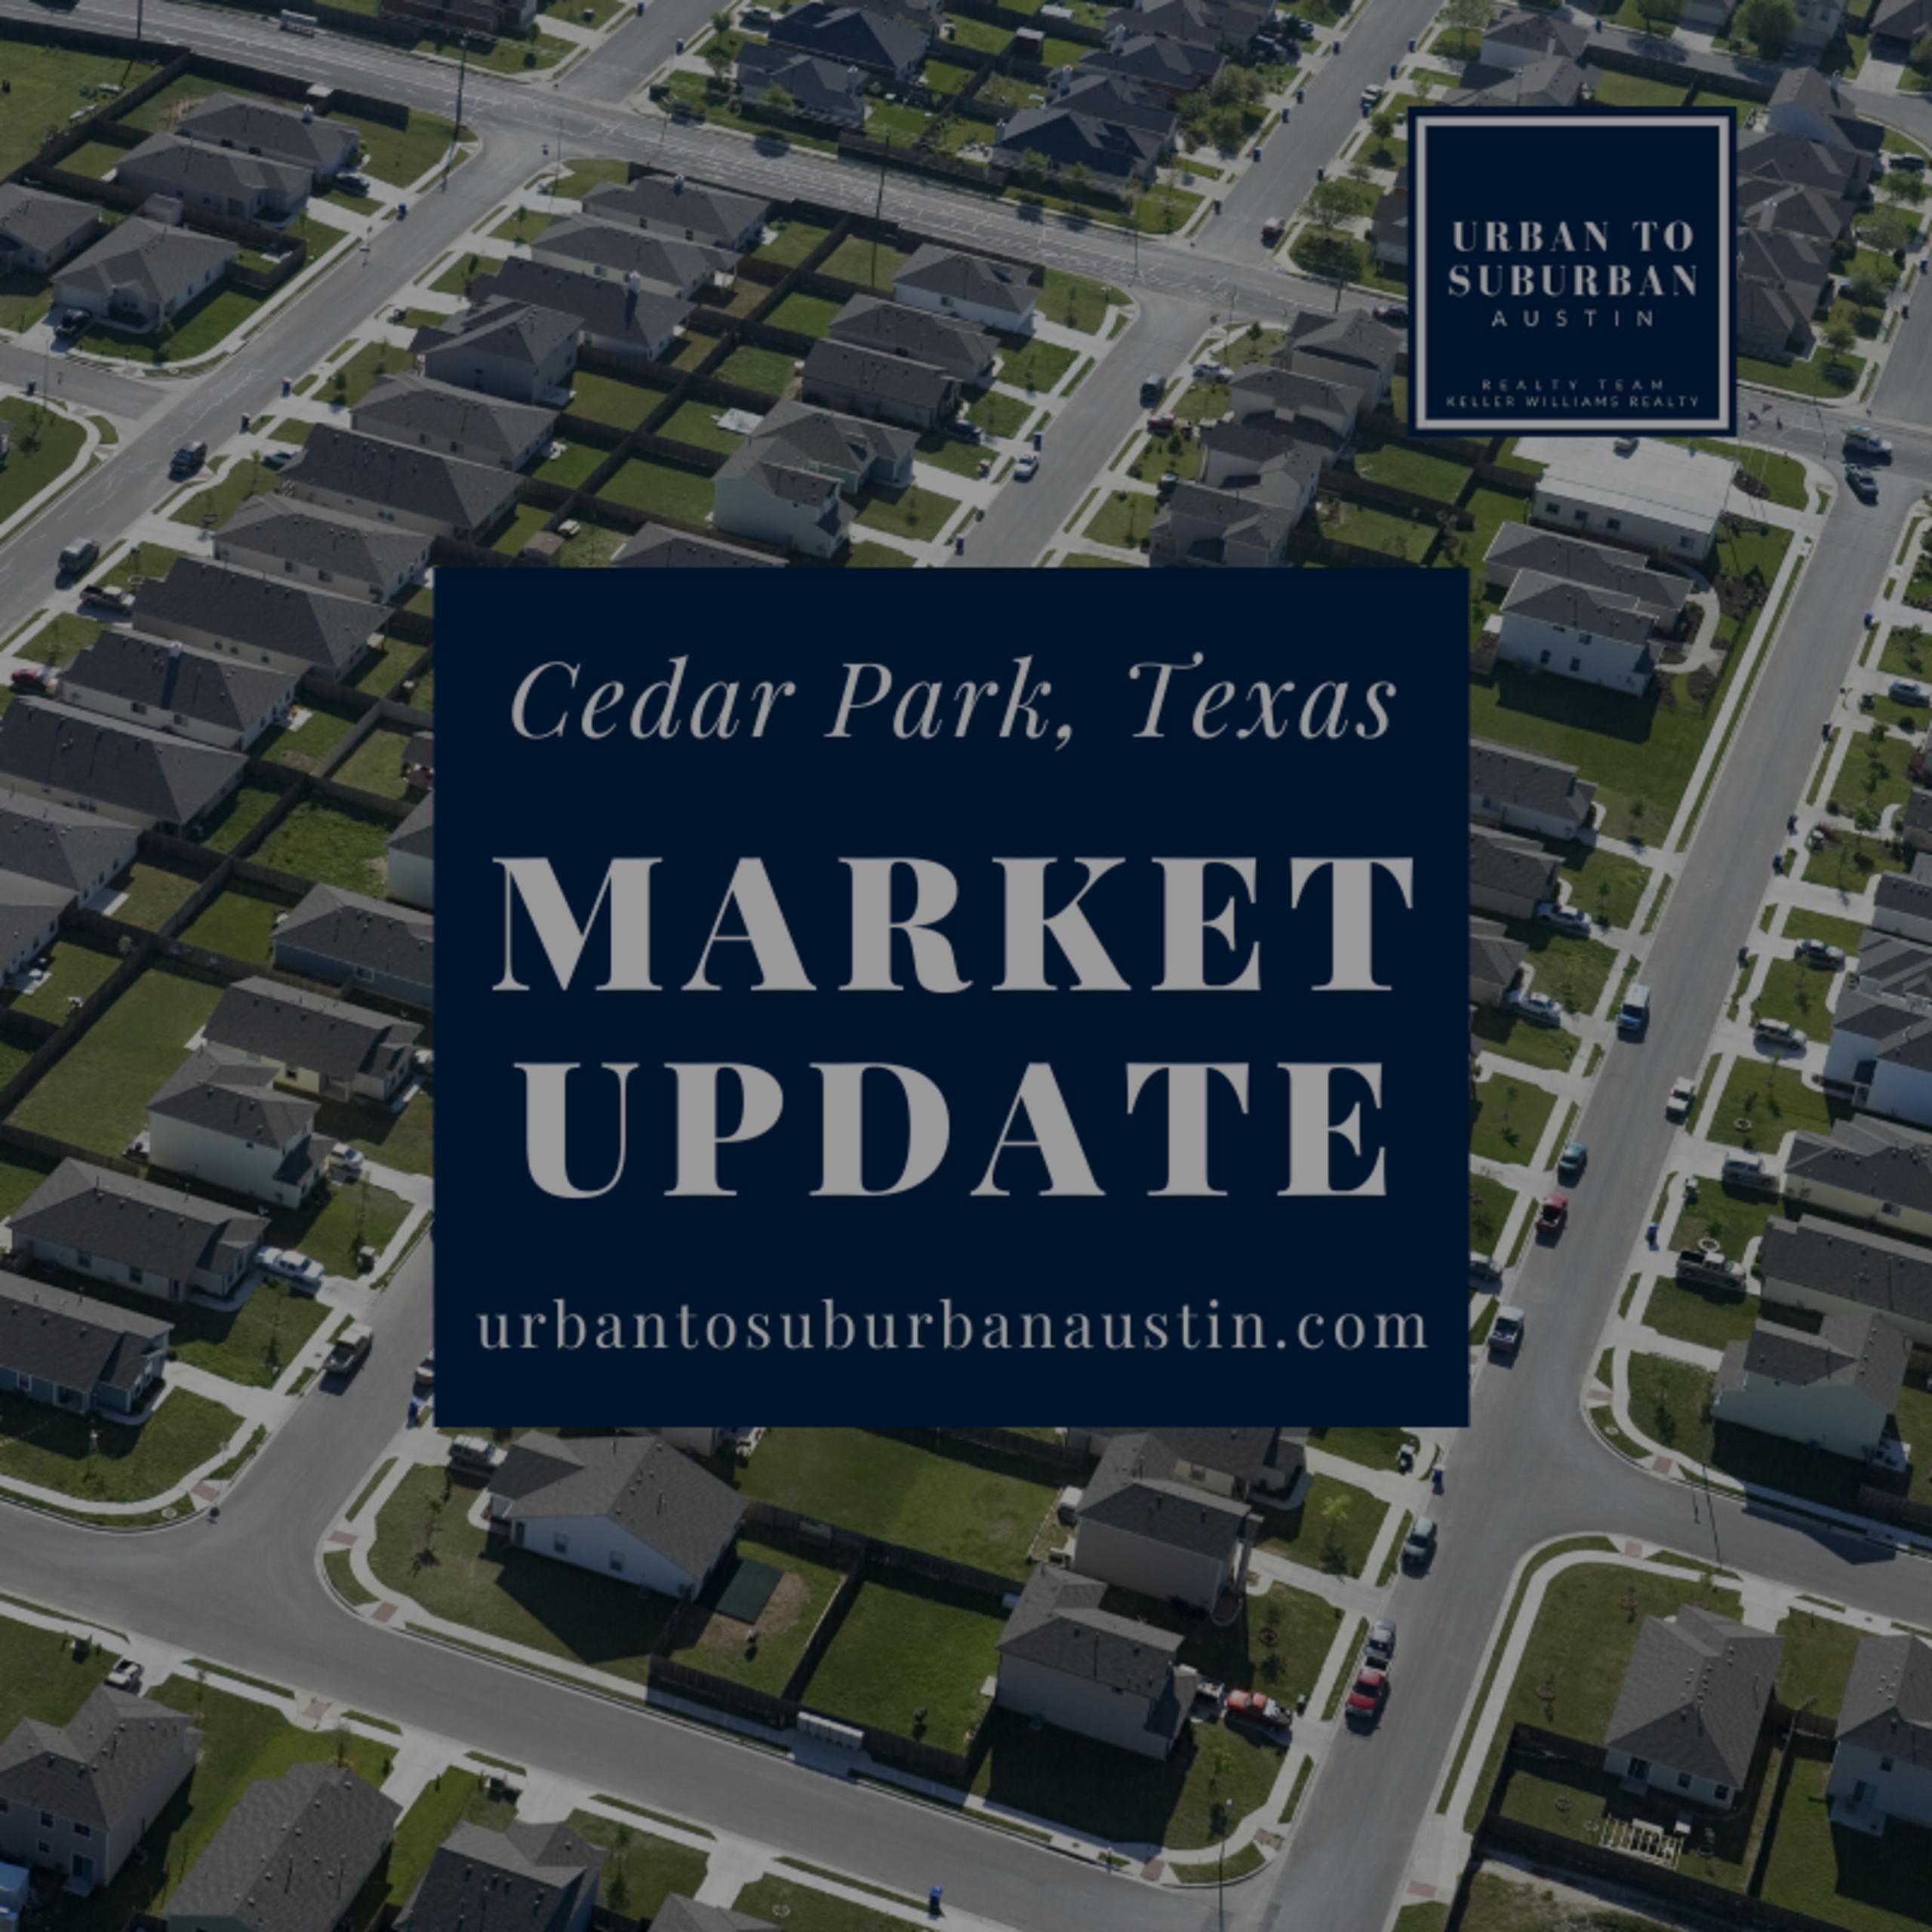 CEDAR PARK, TEXAS HOUSING MARKET UPDATE FOR NOVEMBER 2019